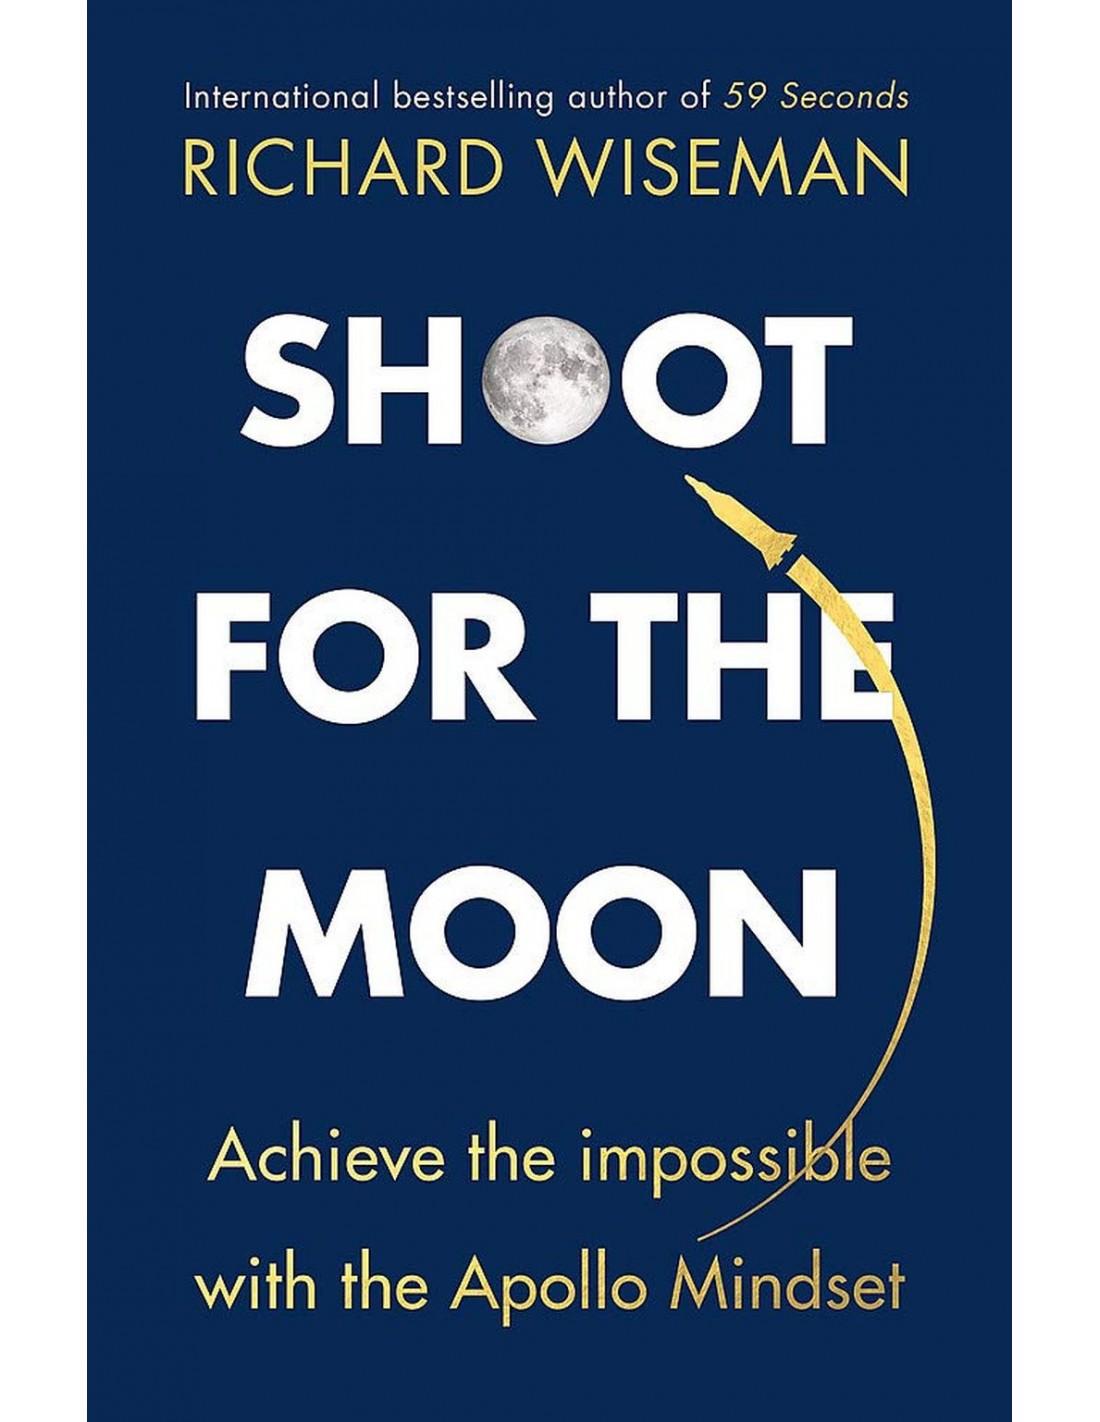 59 Seconds Richard Wiseman shoot for the moon-adrion ltd